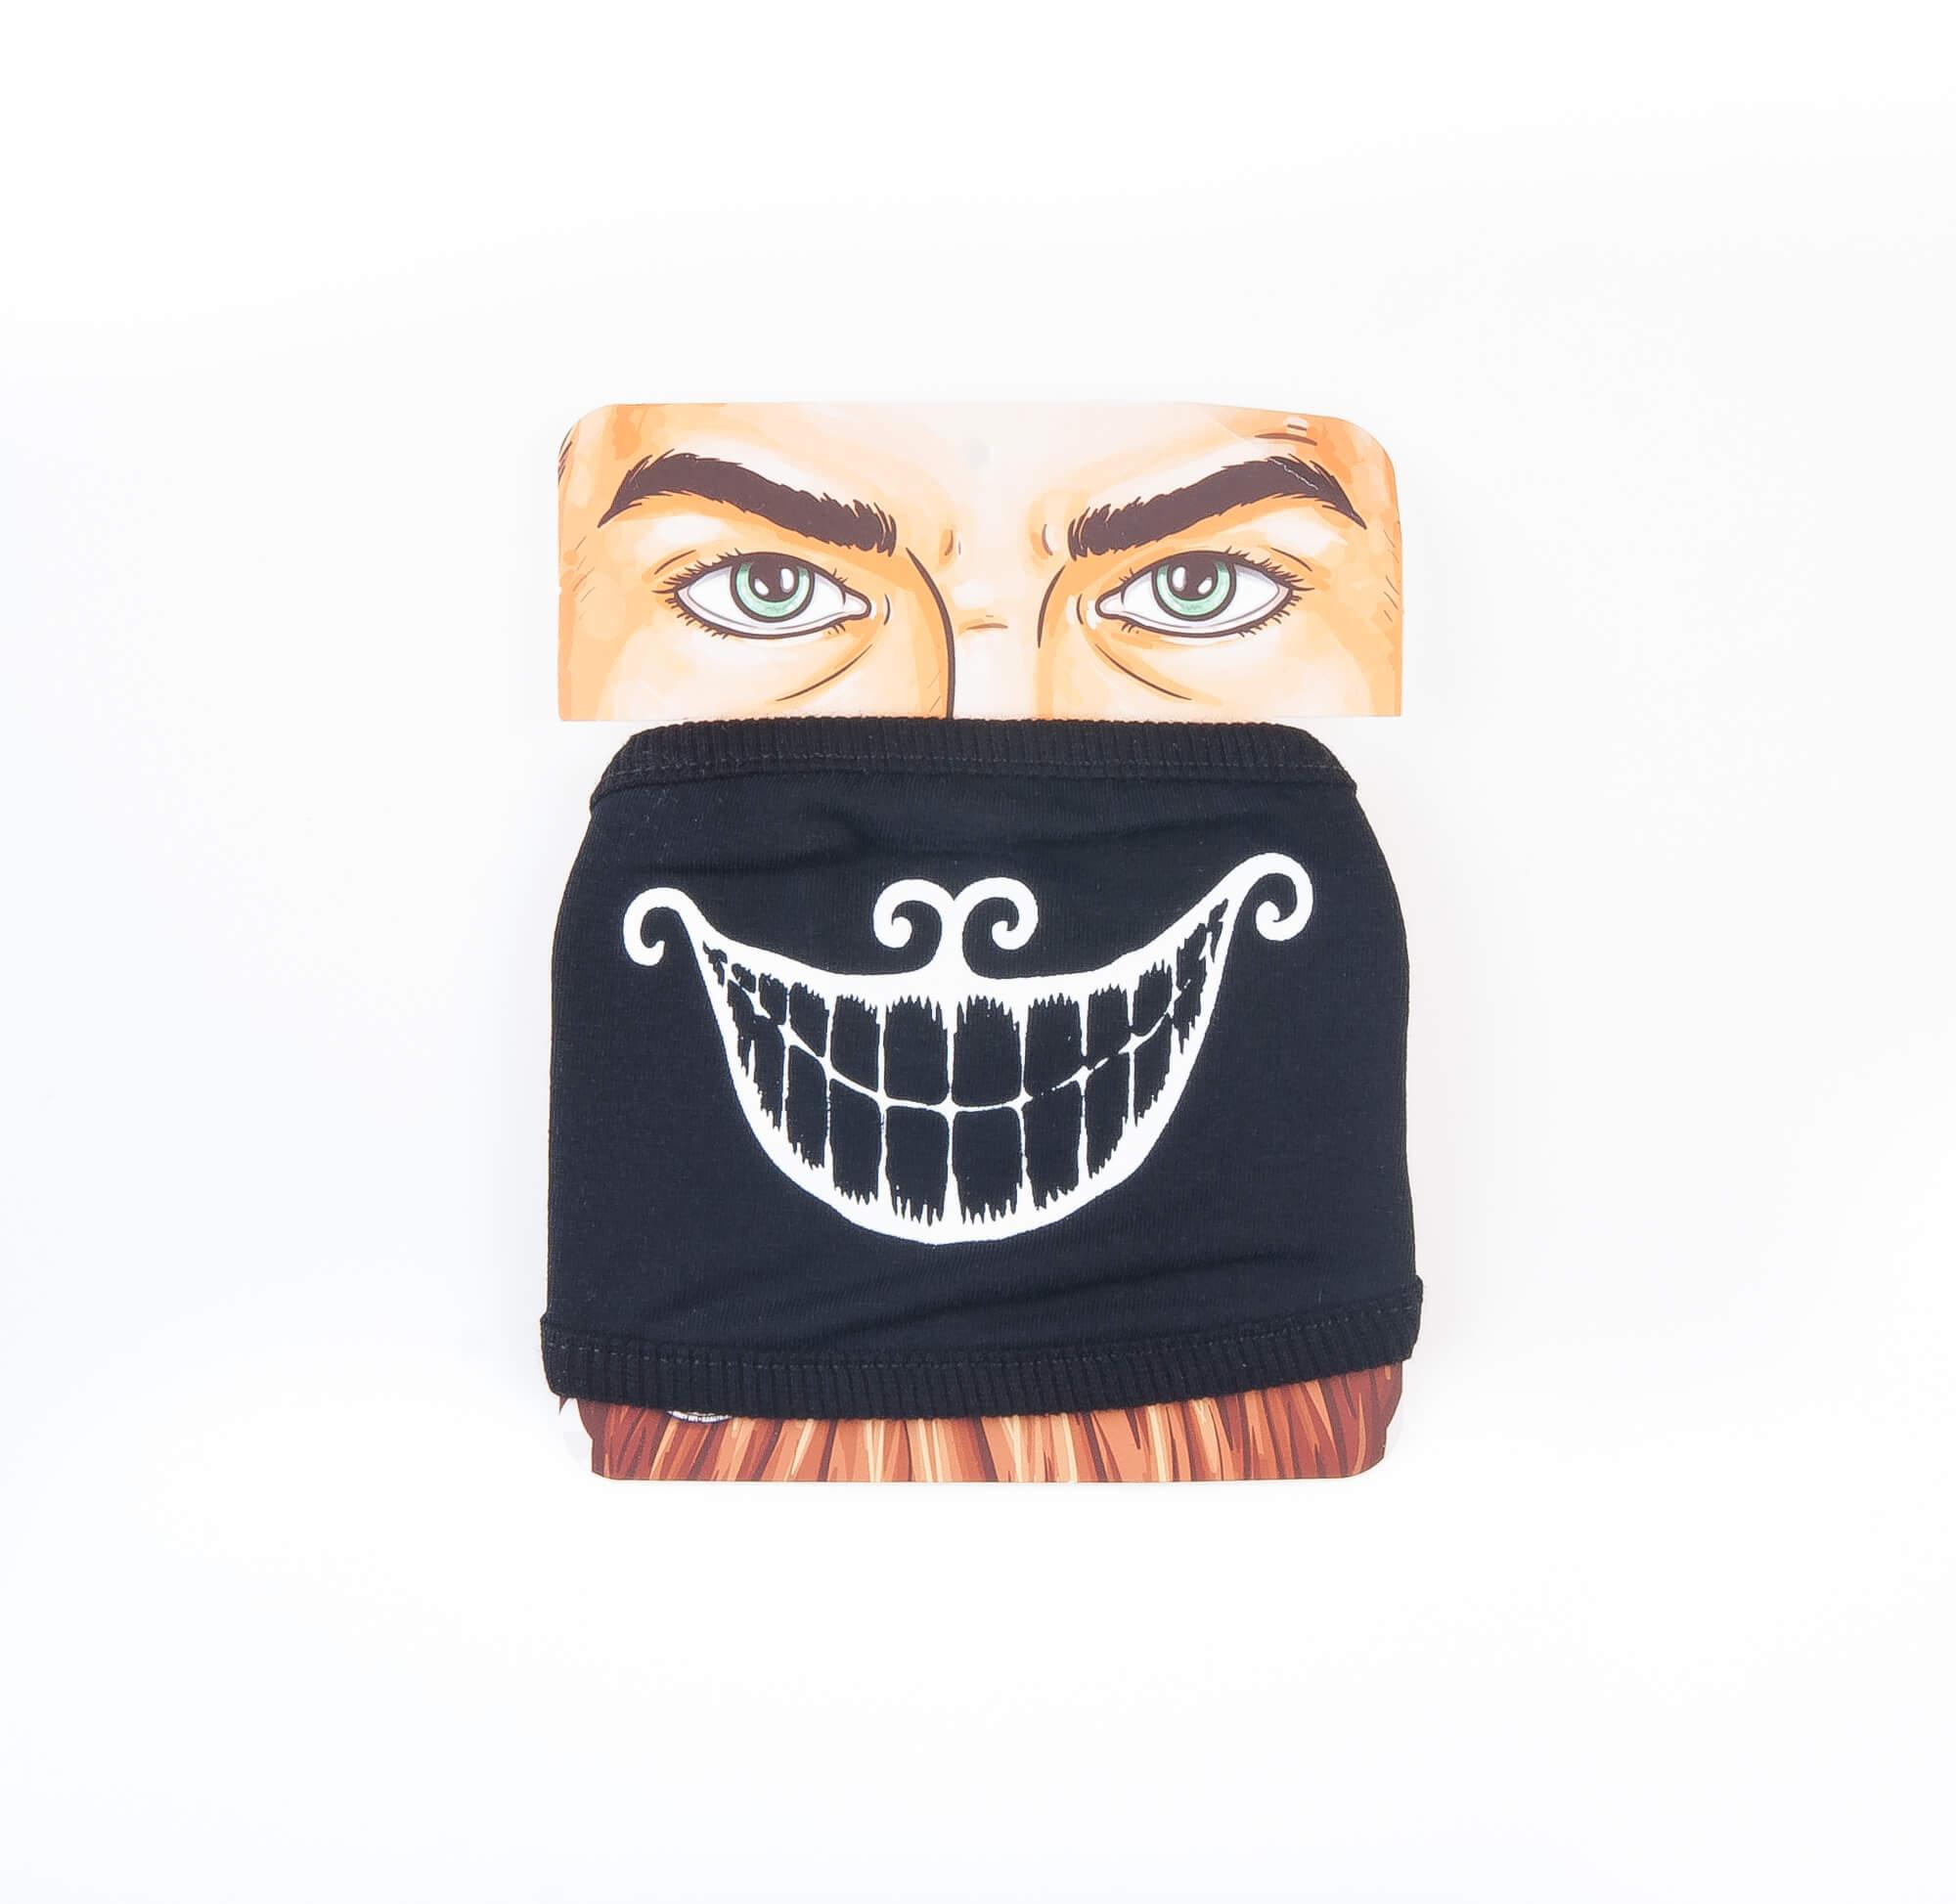 ماسک بلک لایت طرح دار کد MA1004